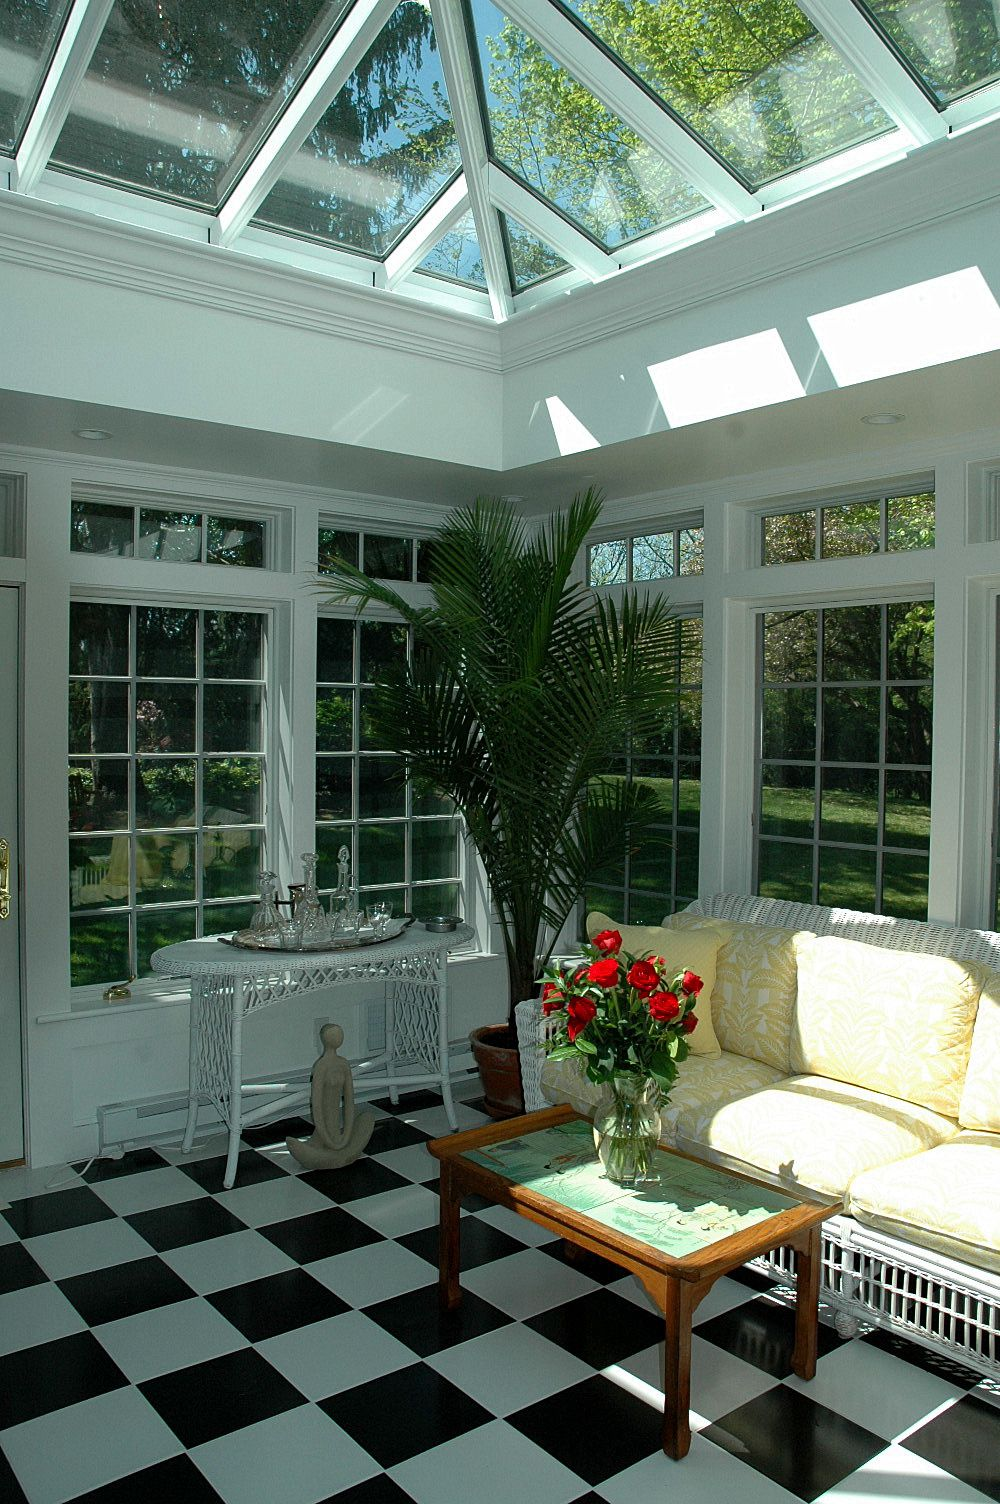 Sunroom Addition House Design Conservatory Design: Conservatory Design, Sunroom, Black, White Tiles